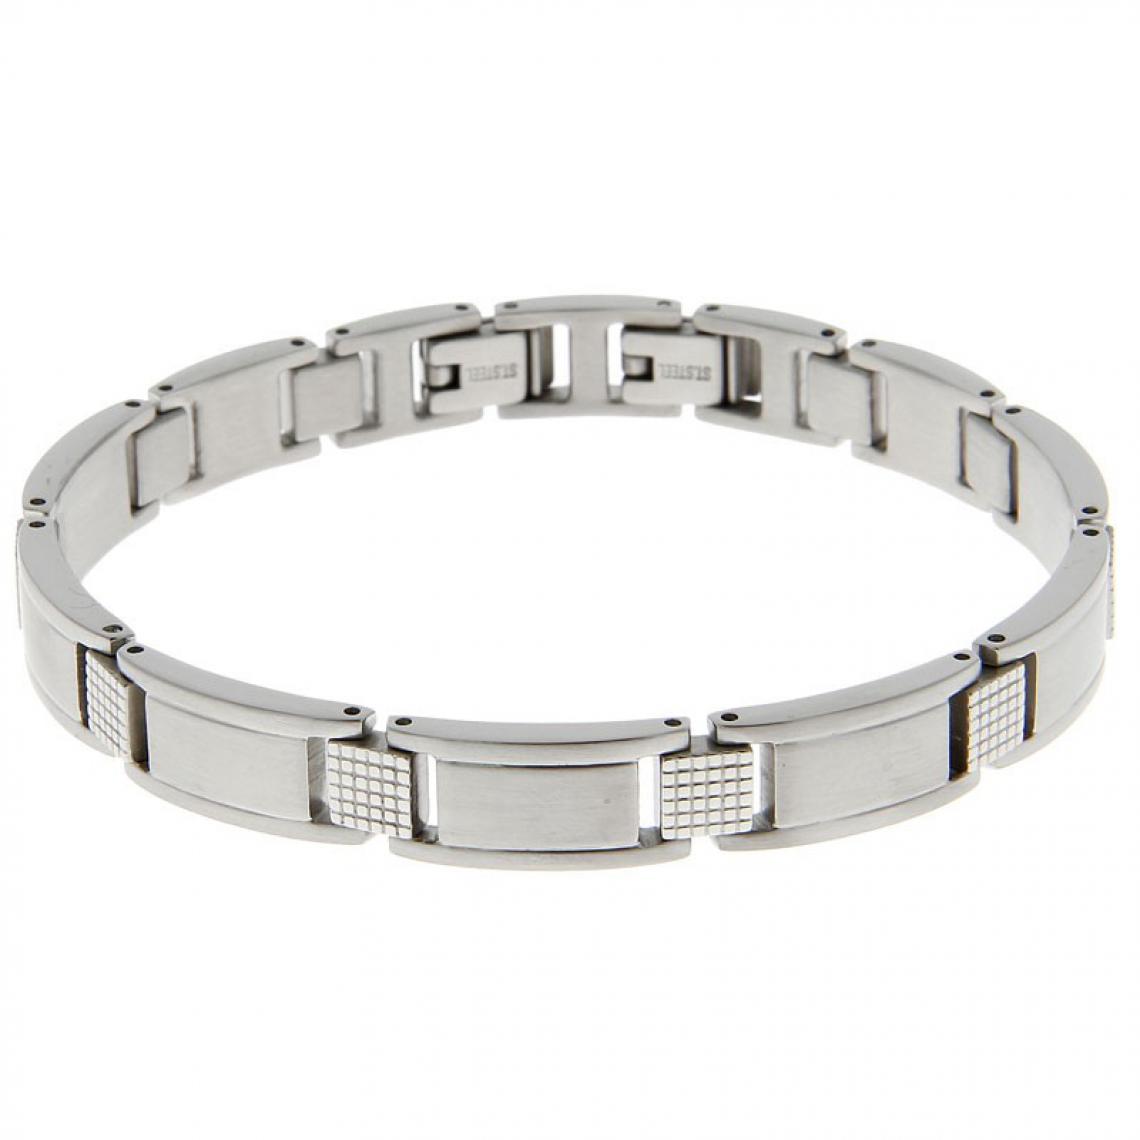 Bracelet LS1588-2/1 - LS1588-2-1 - Modalova